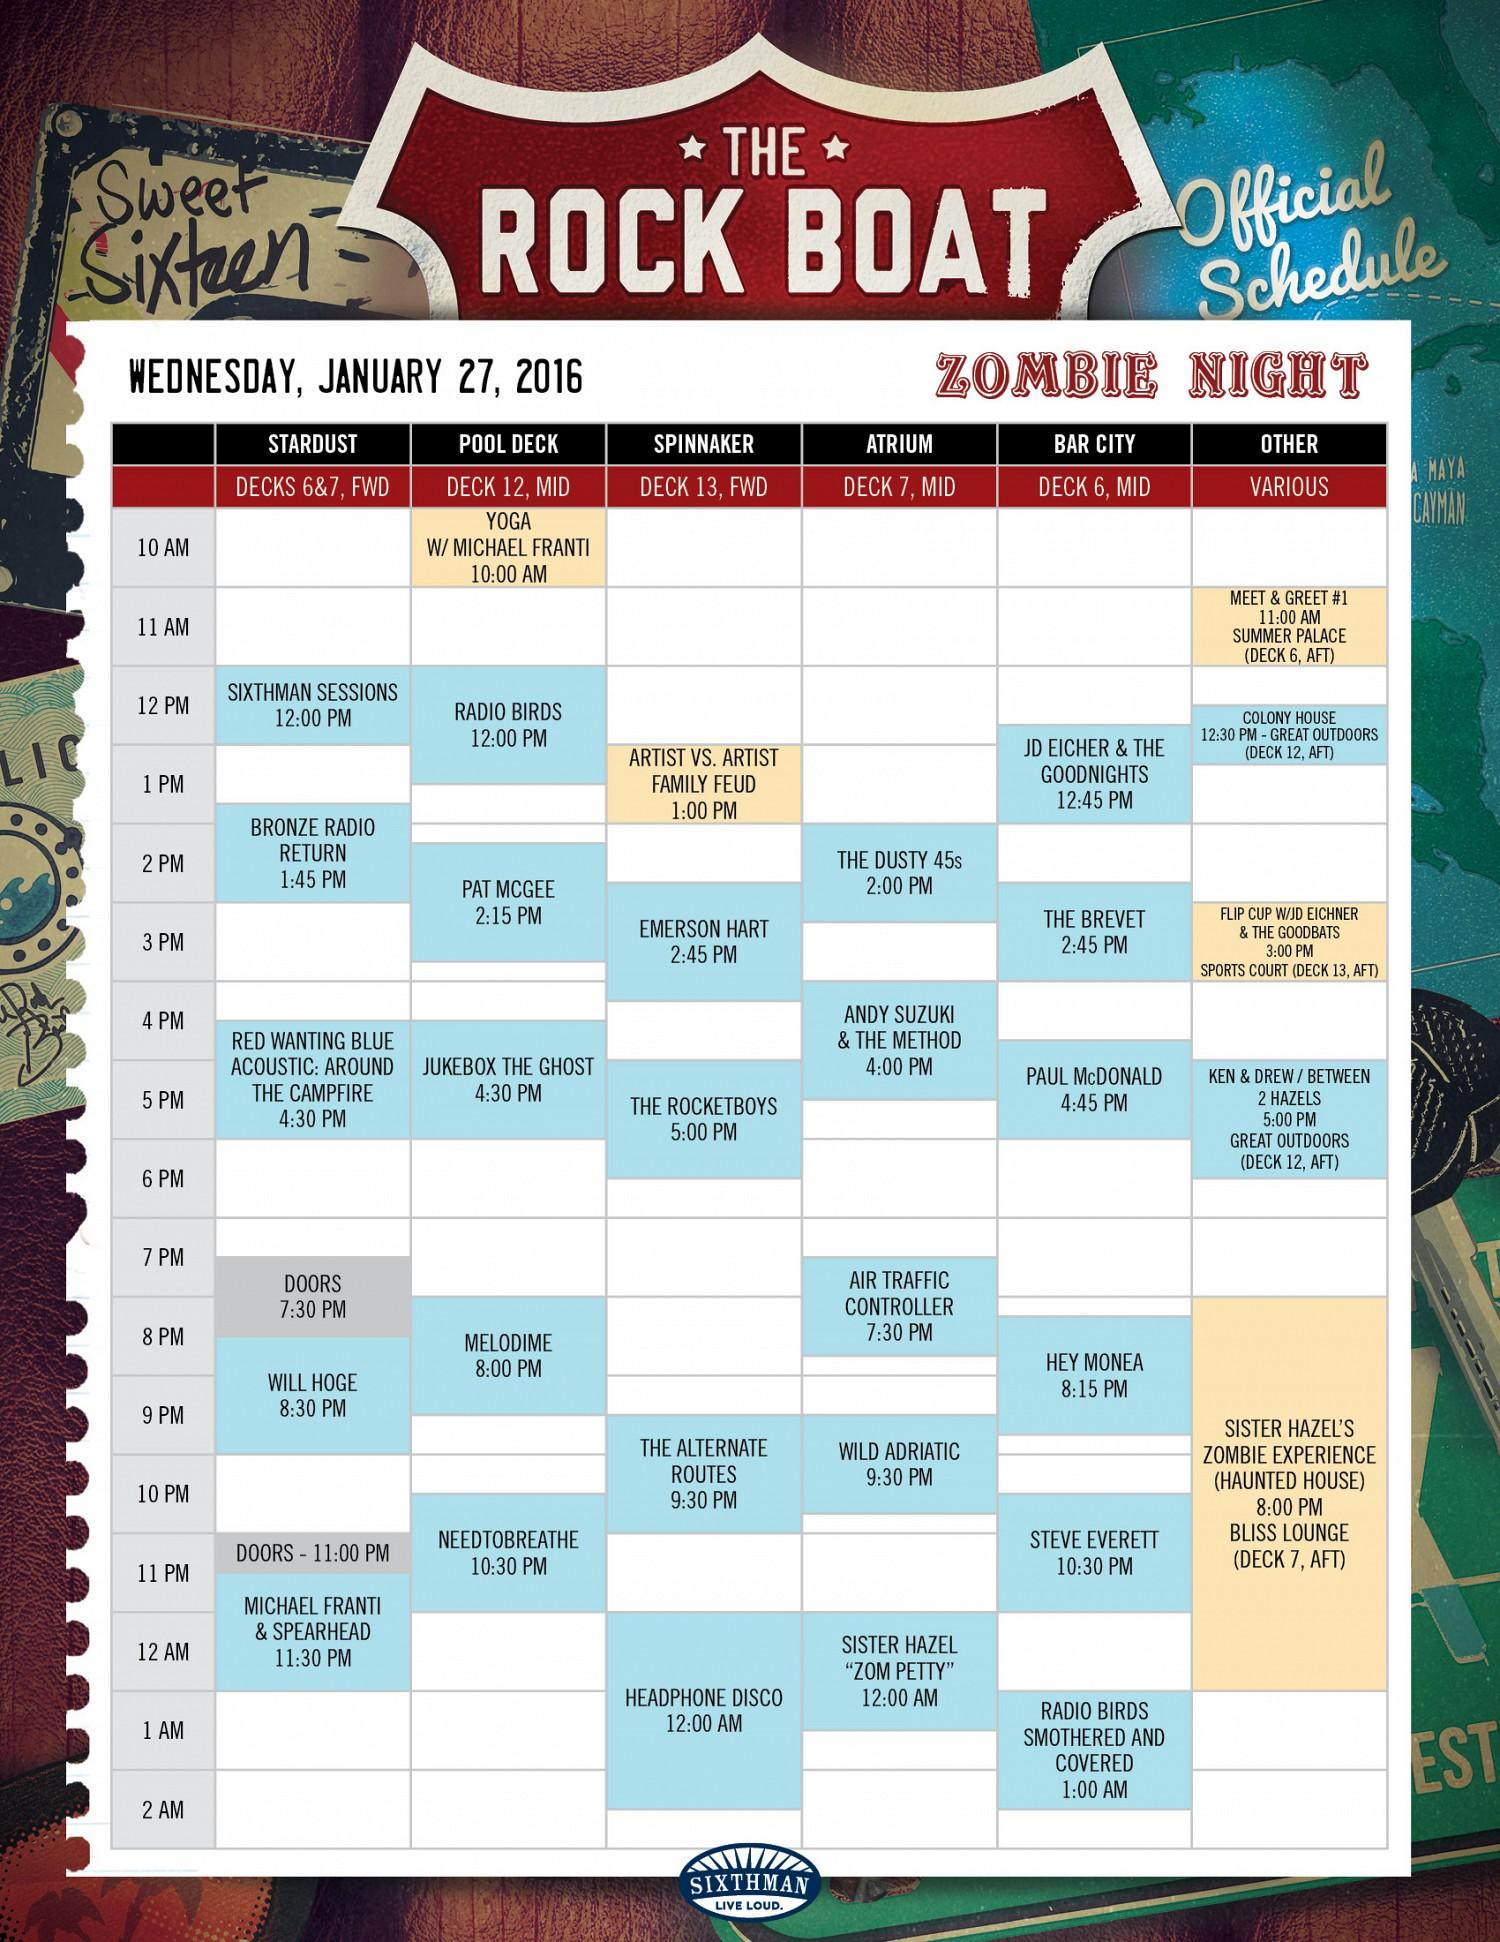 The Rock Boat Schedule